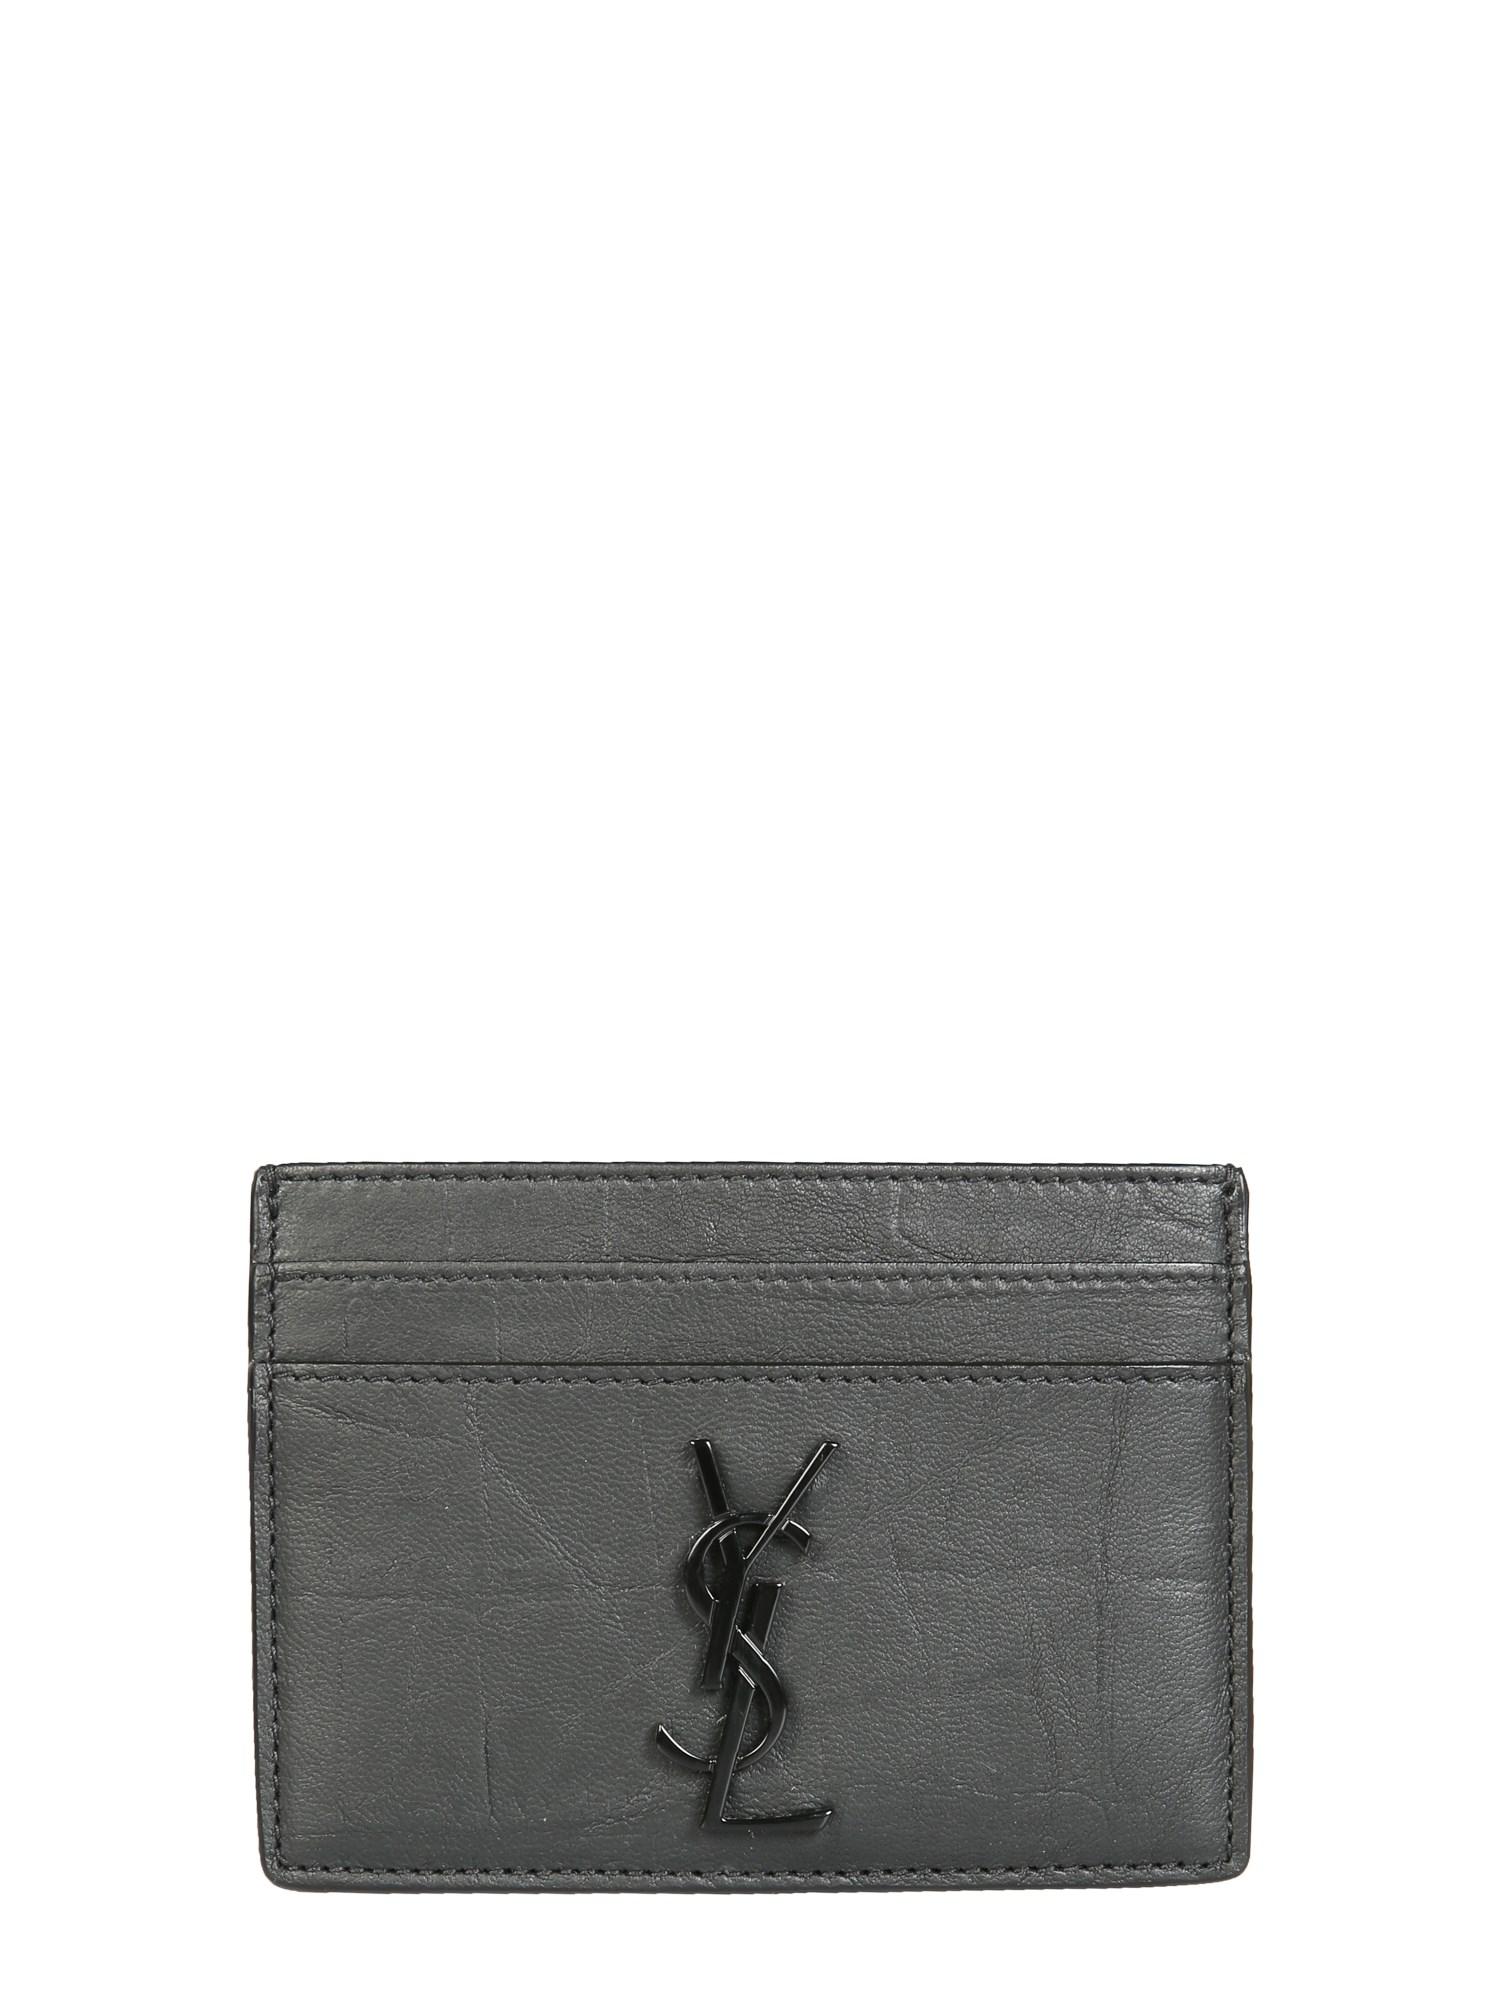 saint laurent card holder with logo